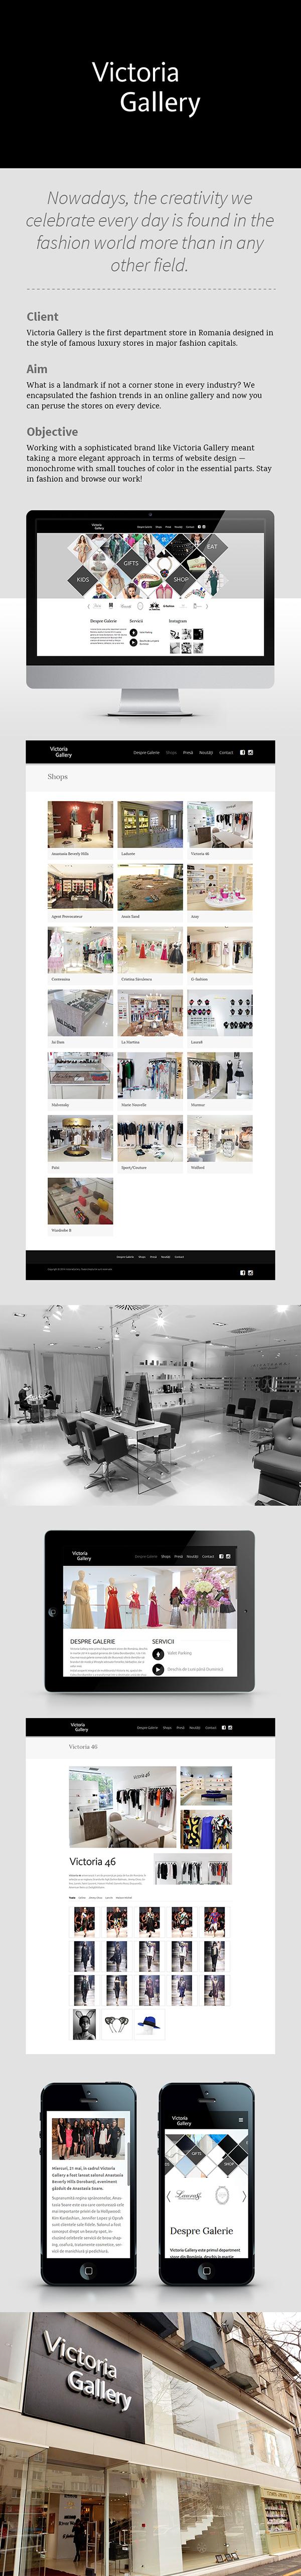 Victoria Gallery - Website